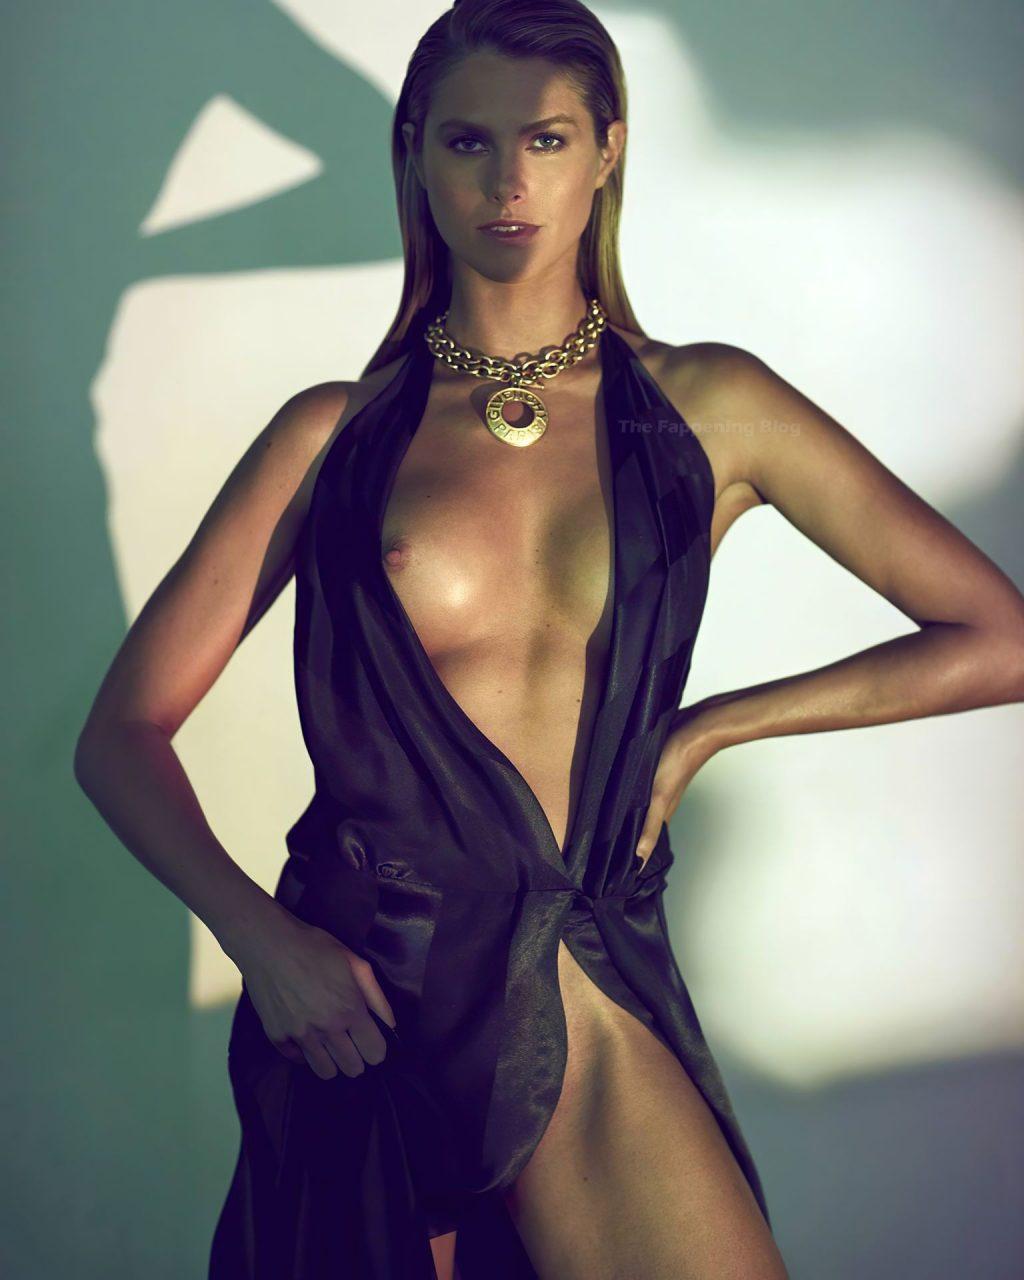 Natalie Roser Nude & Sexy – The Series 6.0 (13 Photos)